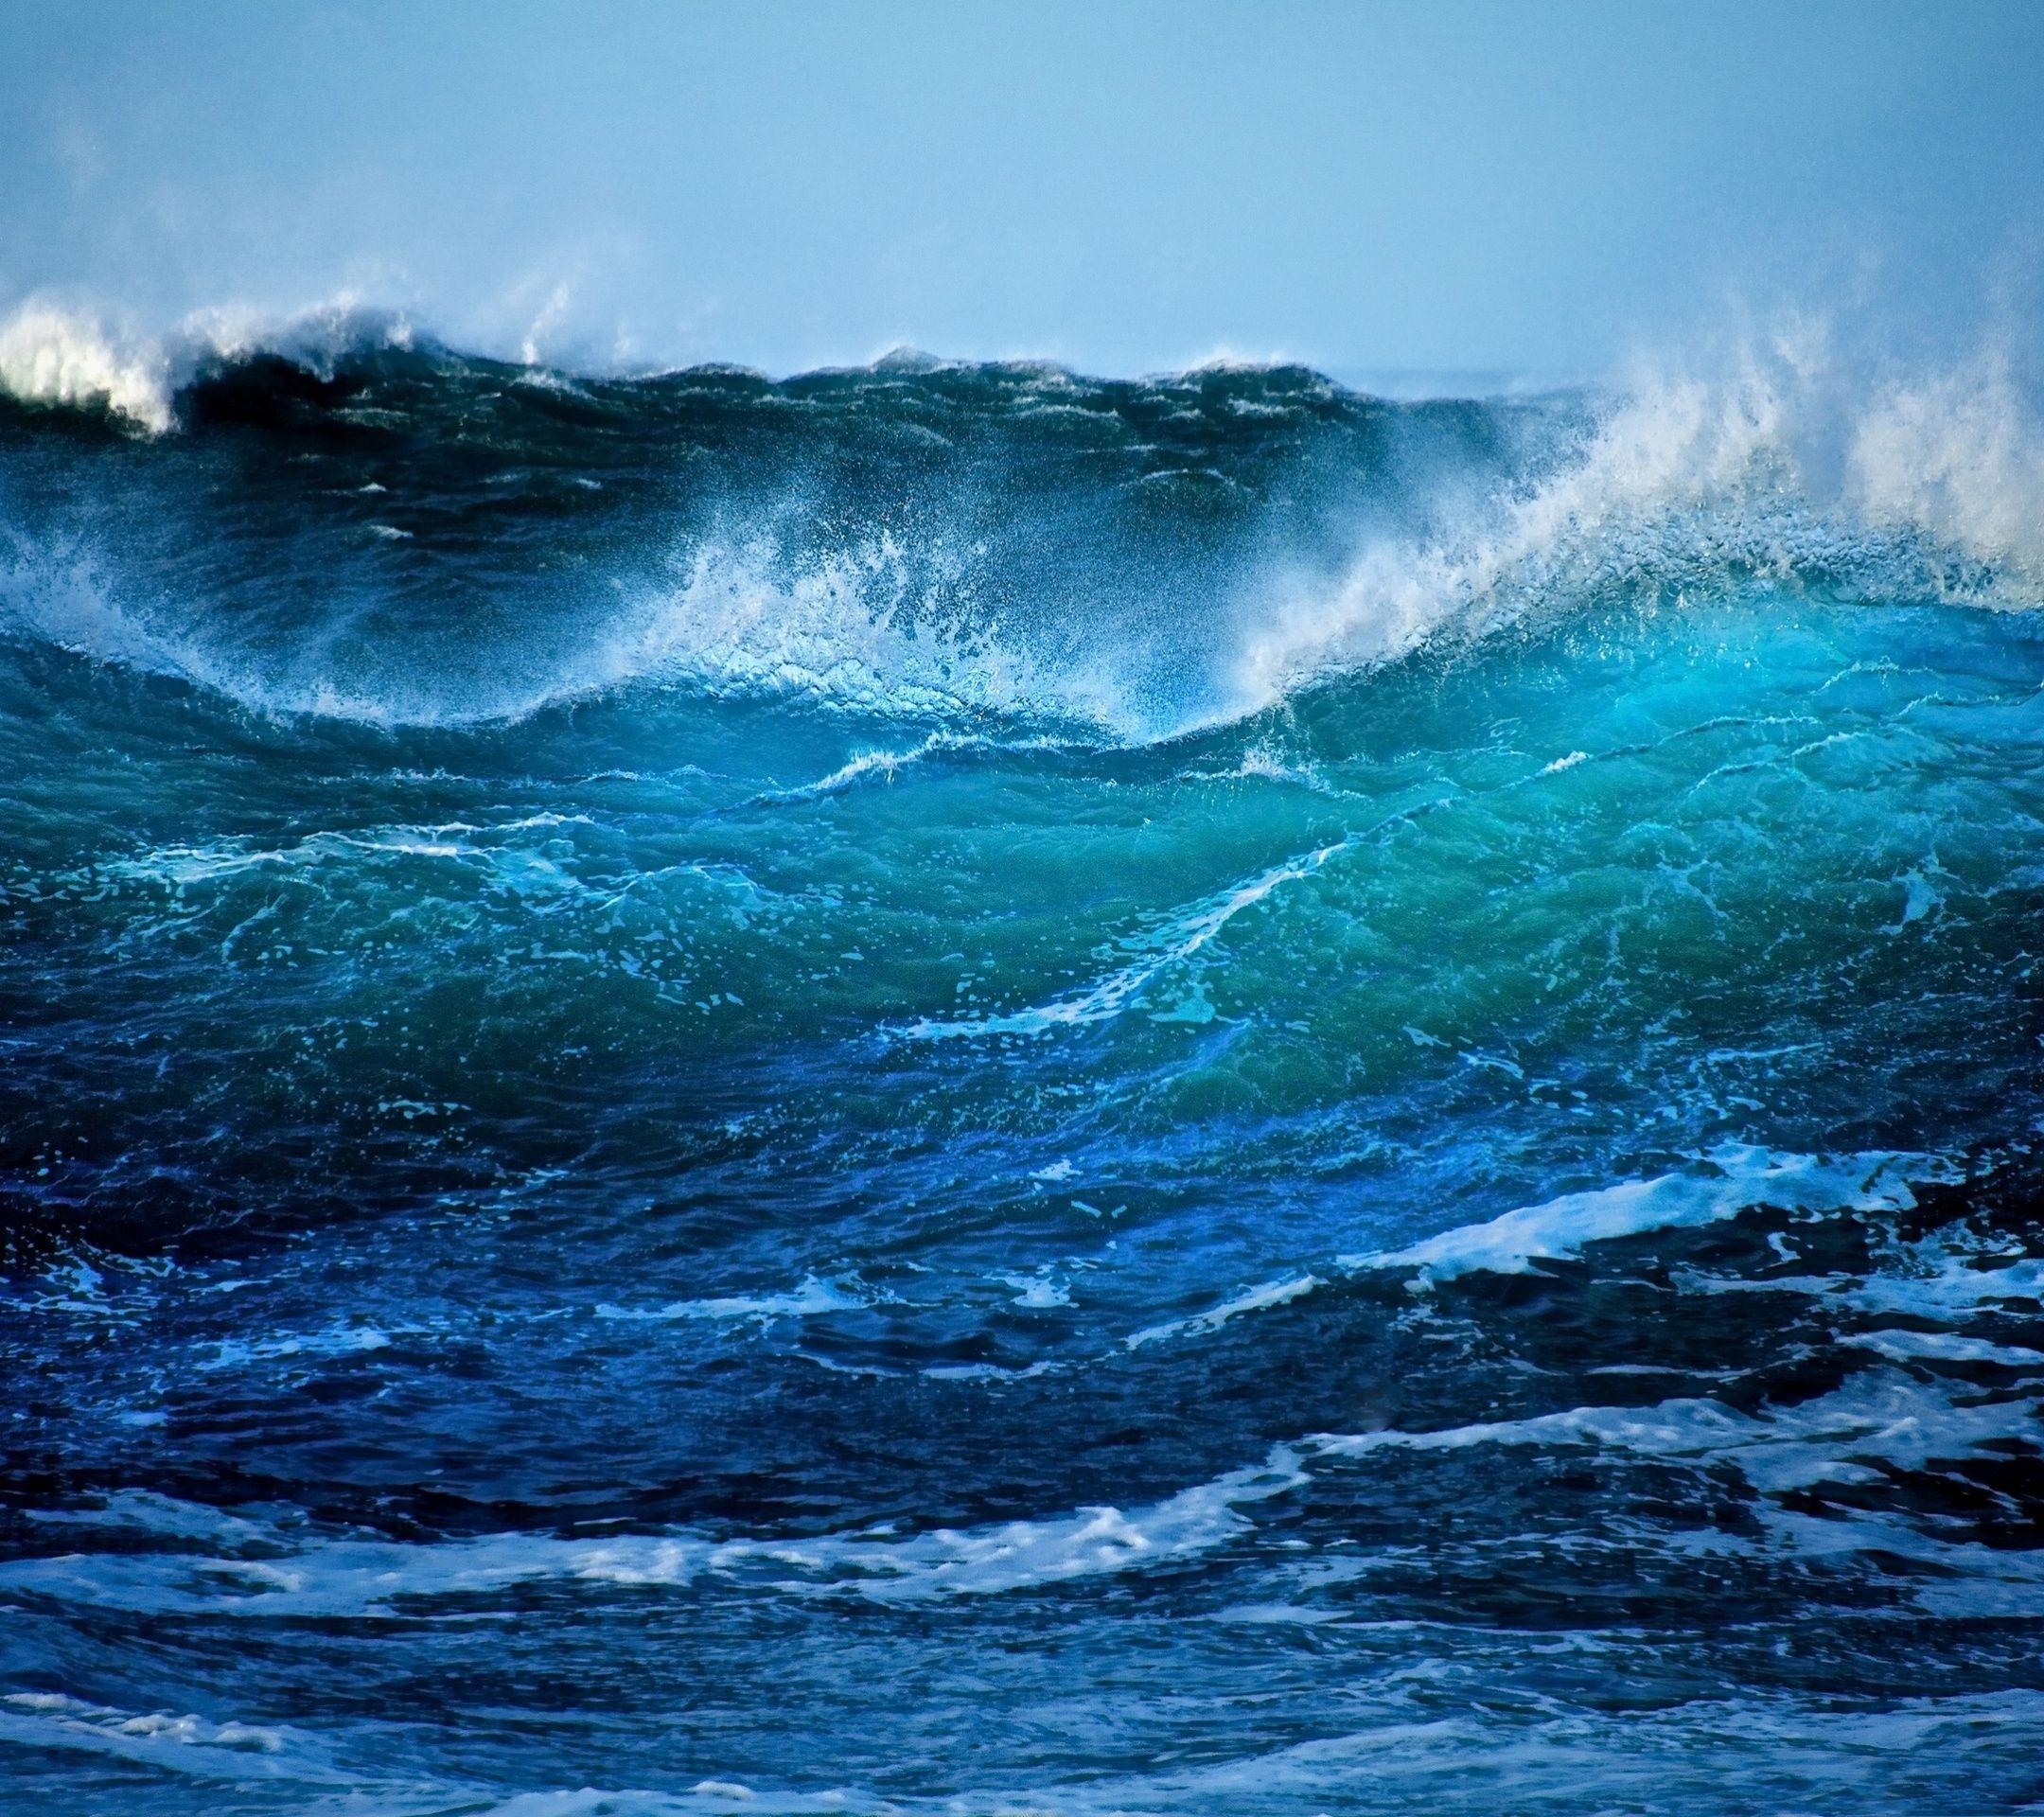 Hd Ocean Wallpaper: Resultado De Imagem Para Wave Wallpaper Hd